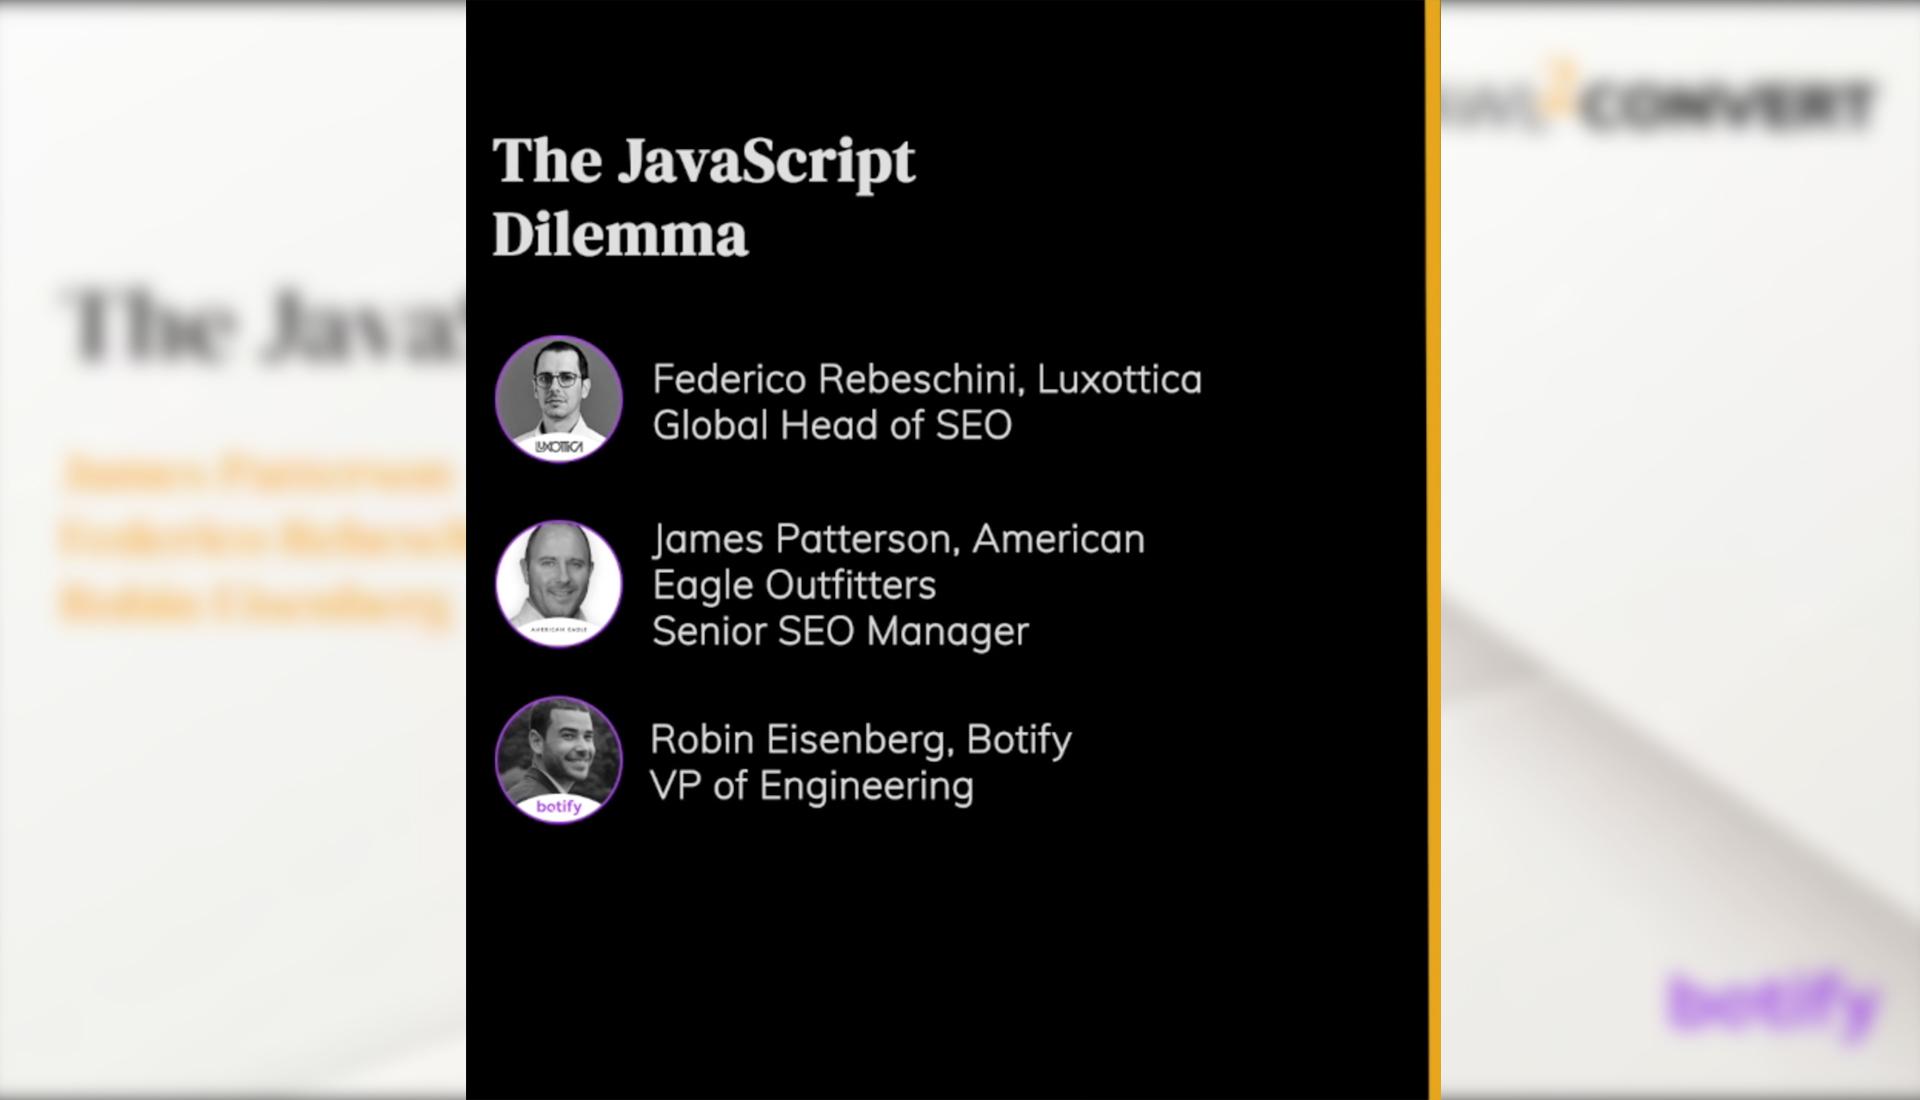 The JavaScript Dilemma